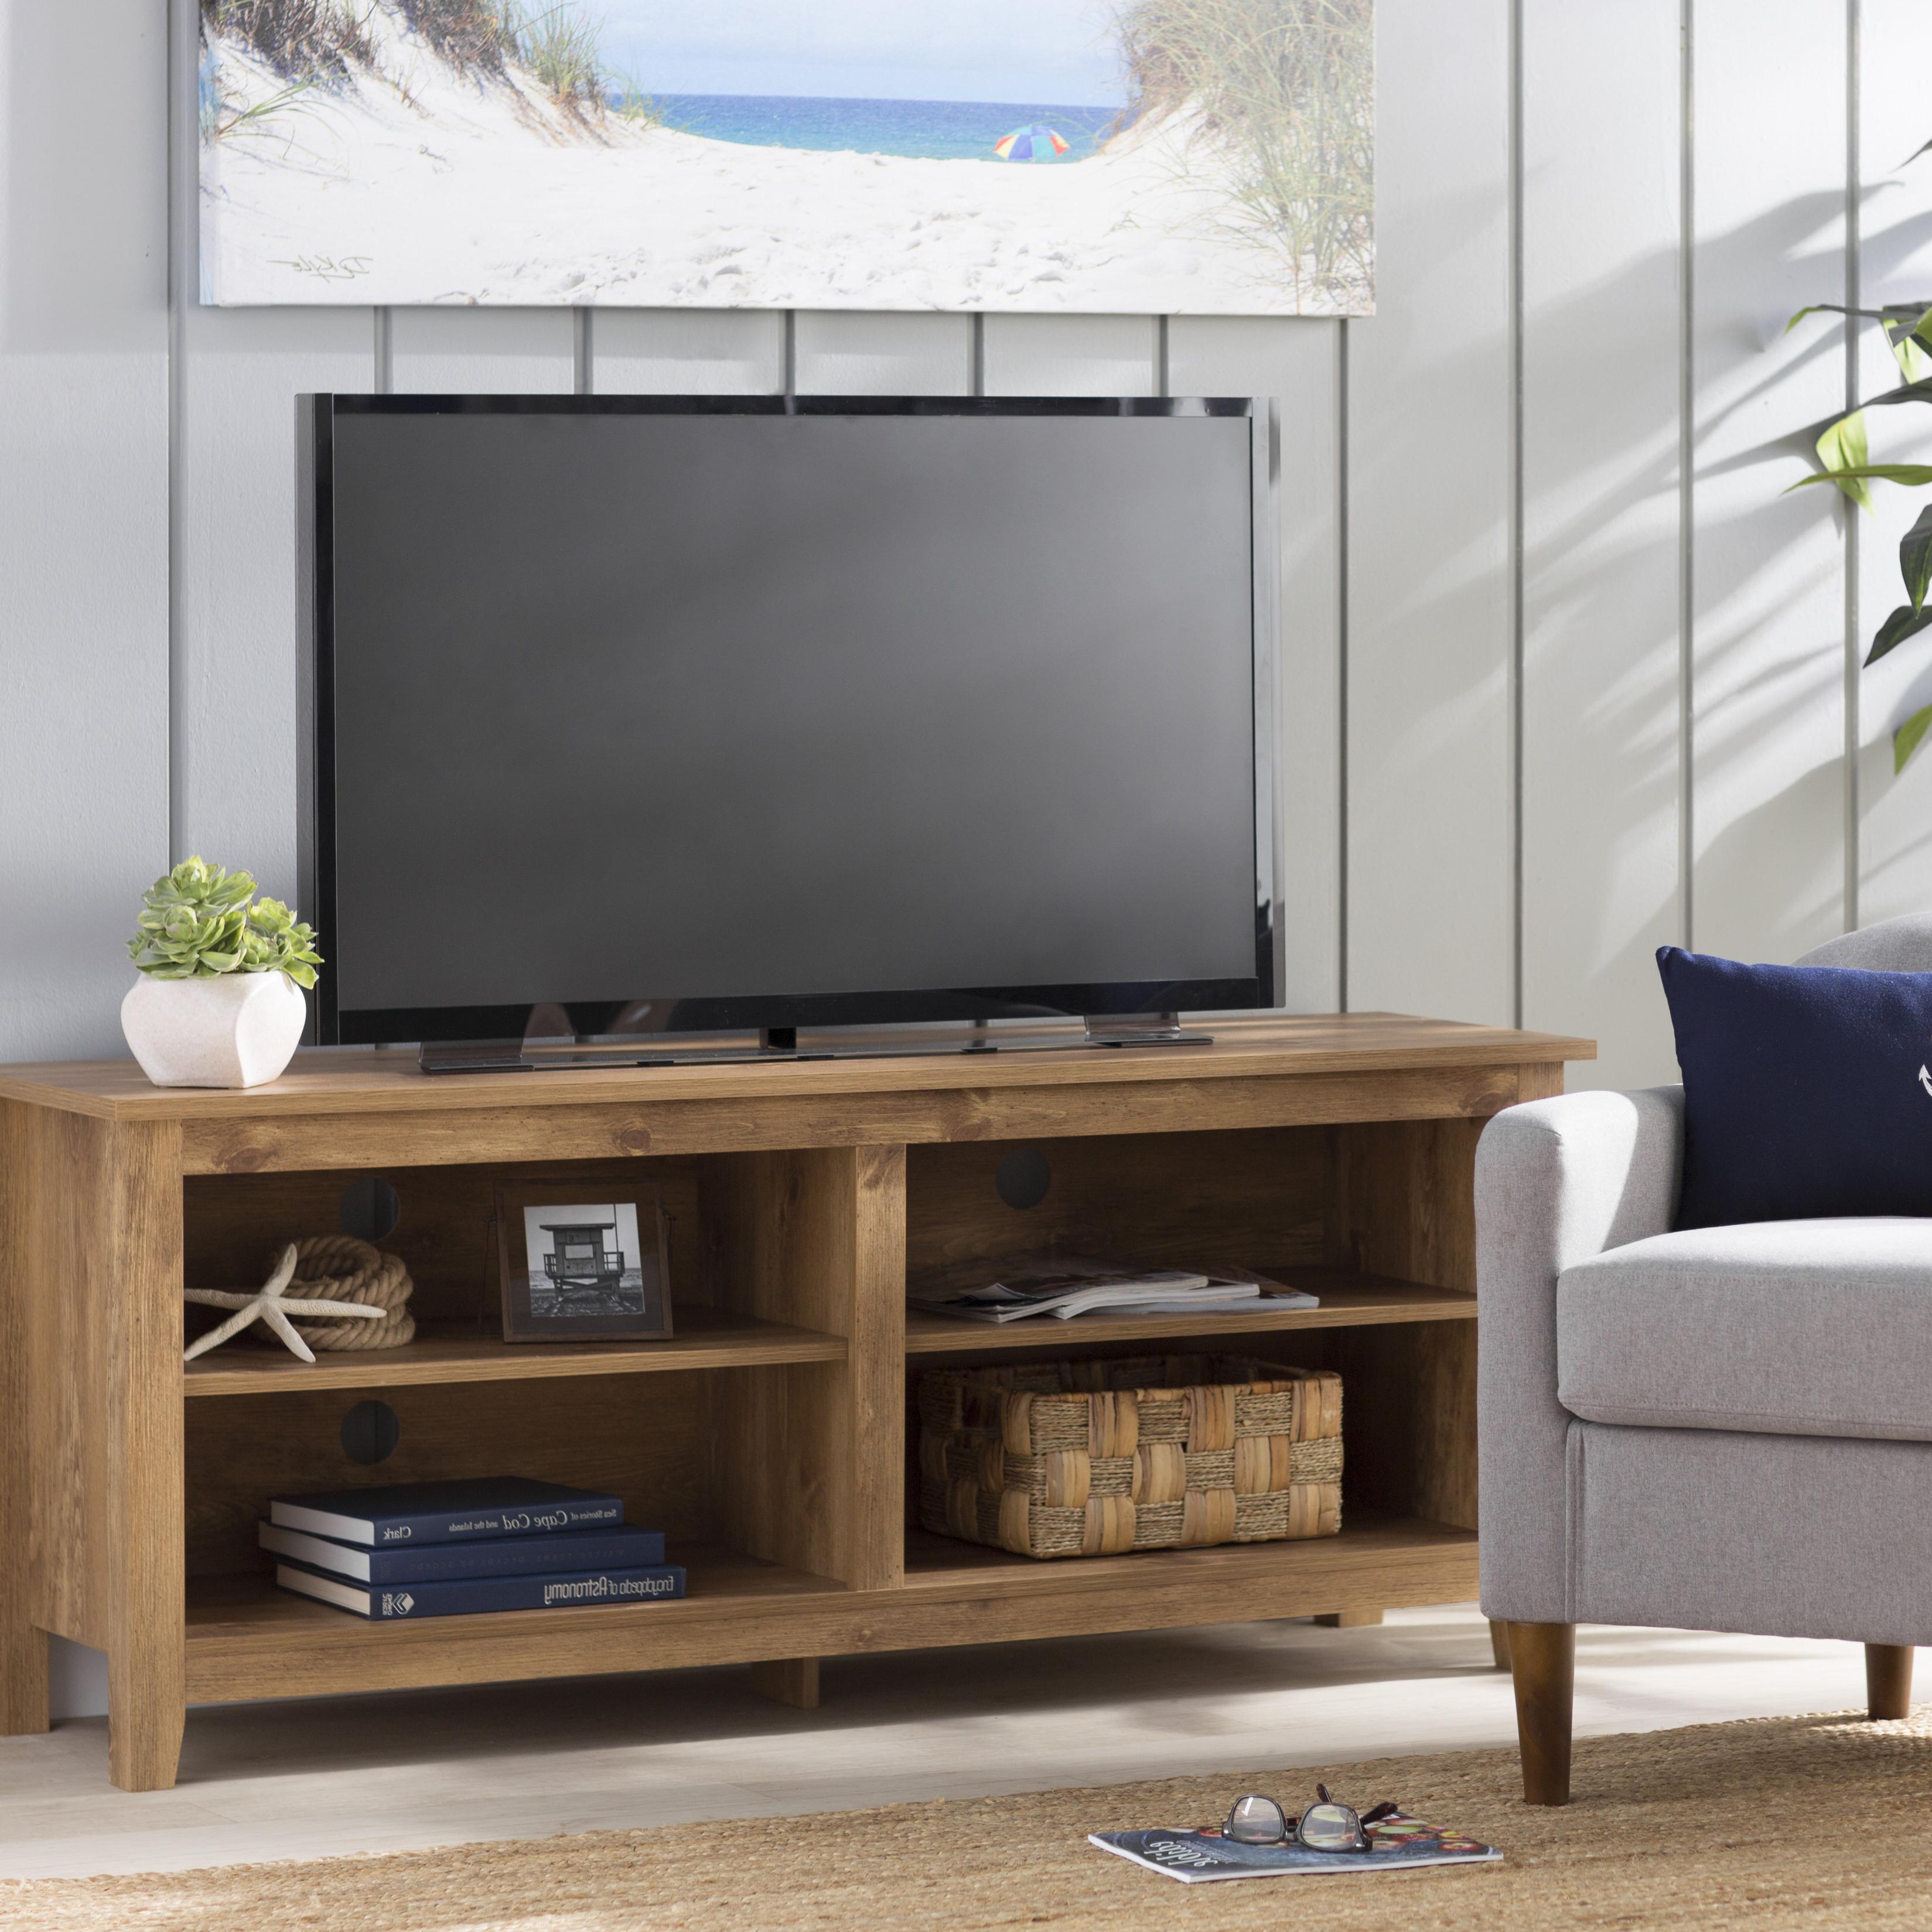 Tv Stand For 75 Inch Tv | Wayfair In Laurent 70 Inch Tv Stands (Gallery 5 of 20)